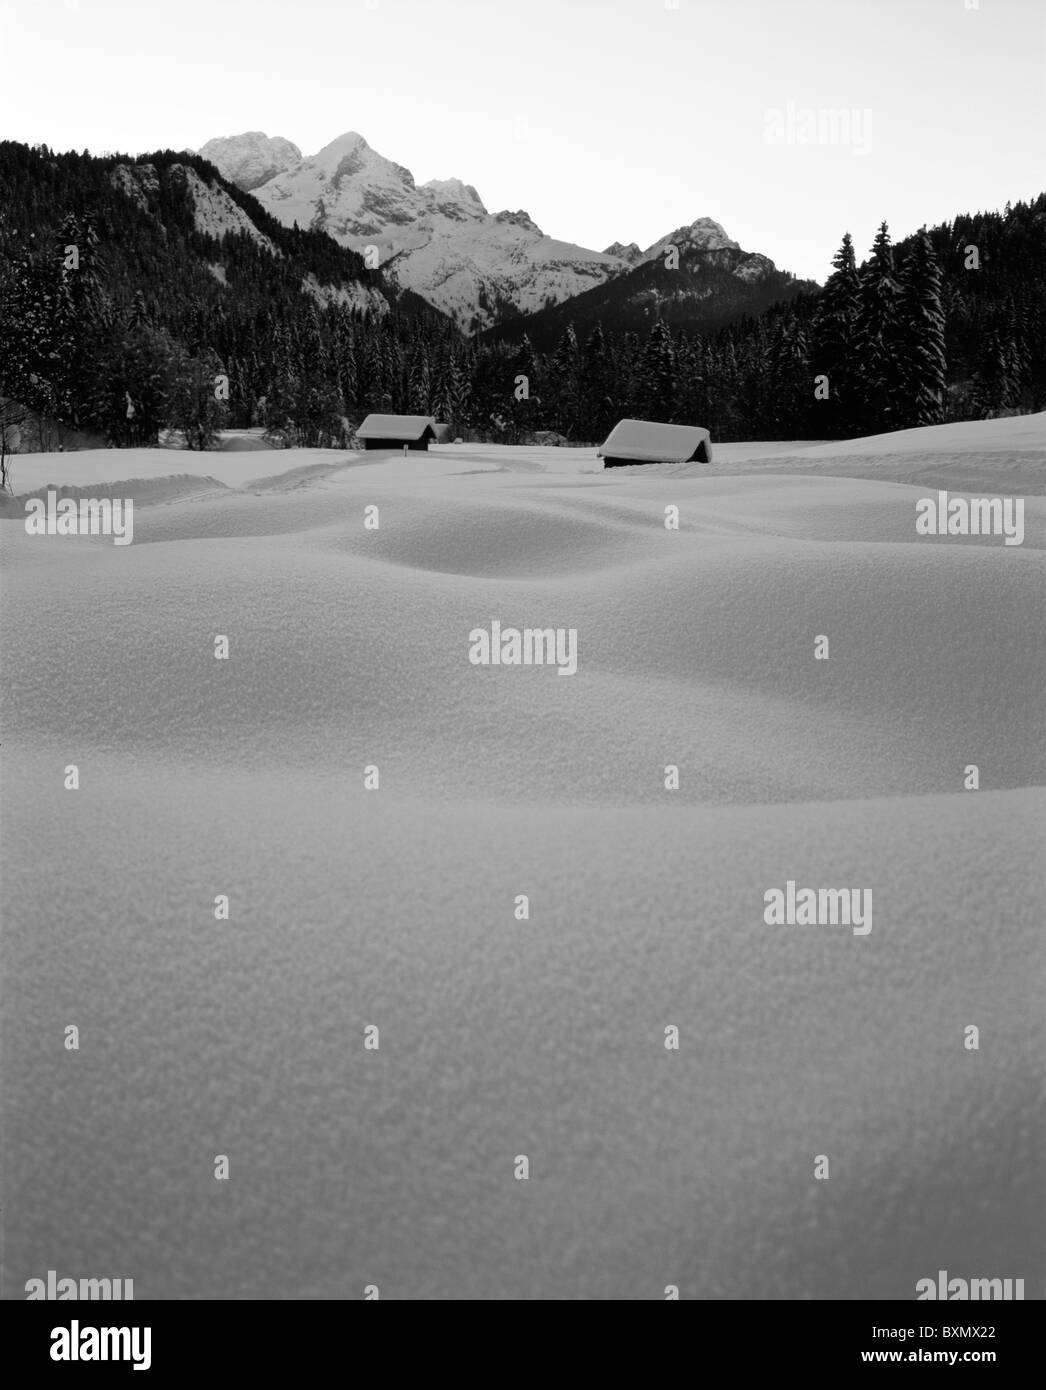 Snow-covered mountain pasture in the Wettersteingebirge (Alps) nearby Garmisch-Partenkirchen, Bavaria, Germany - Stock Image